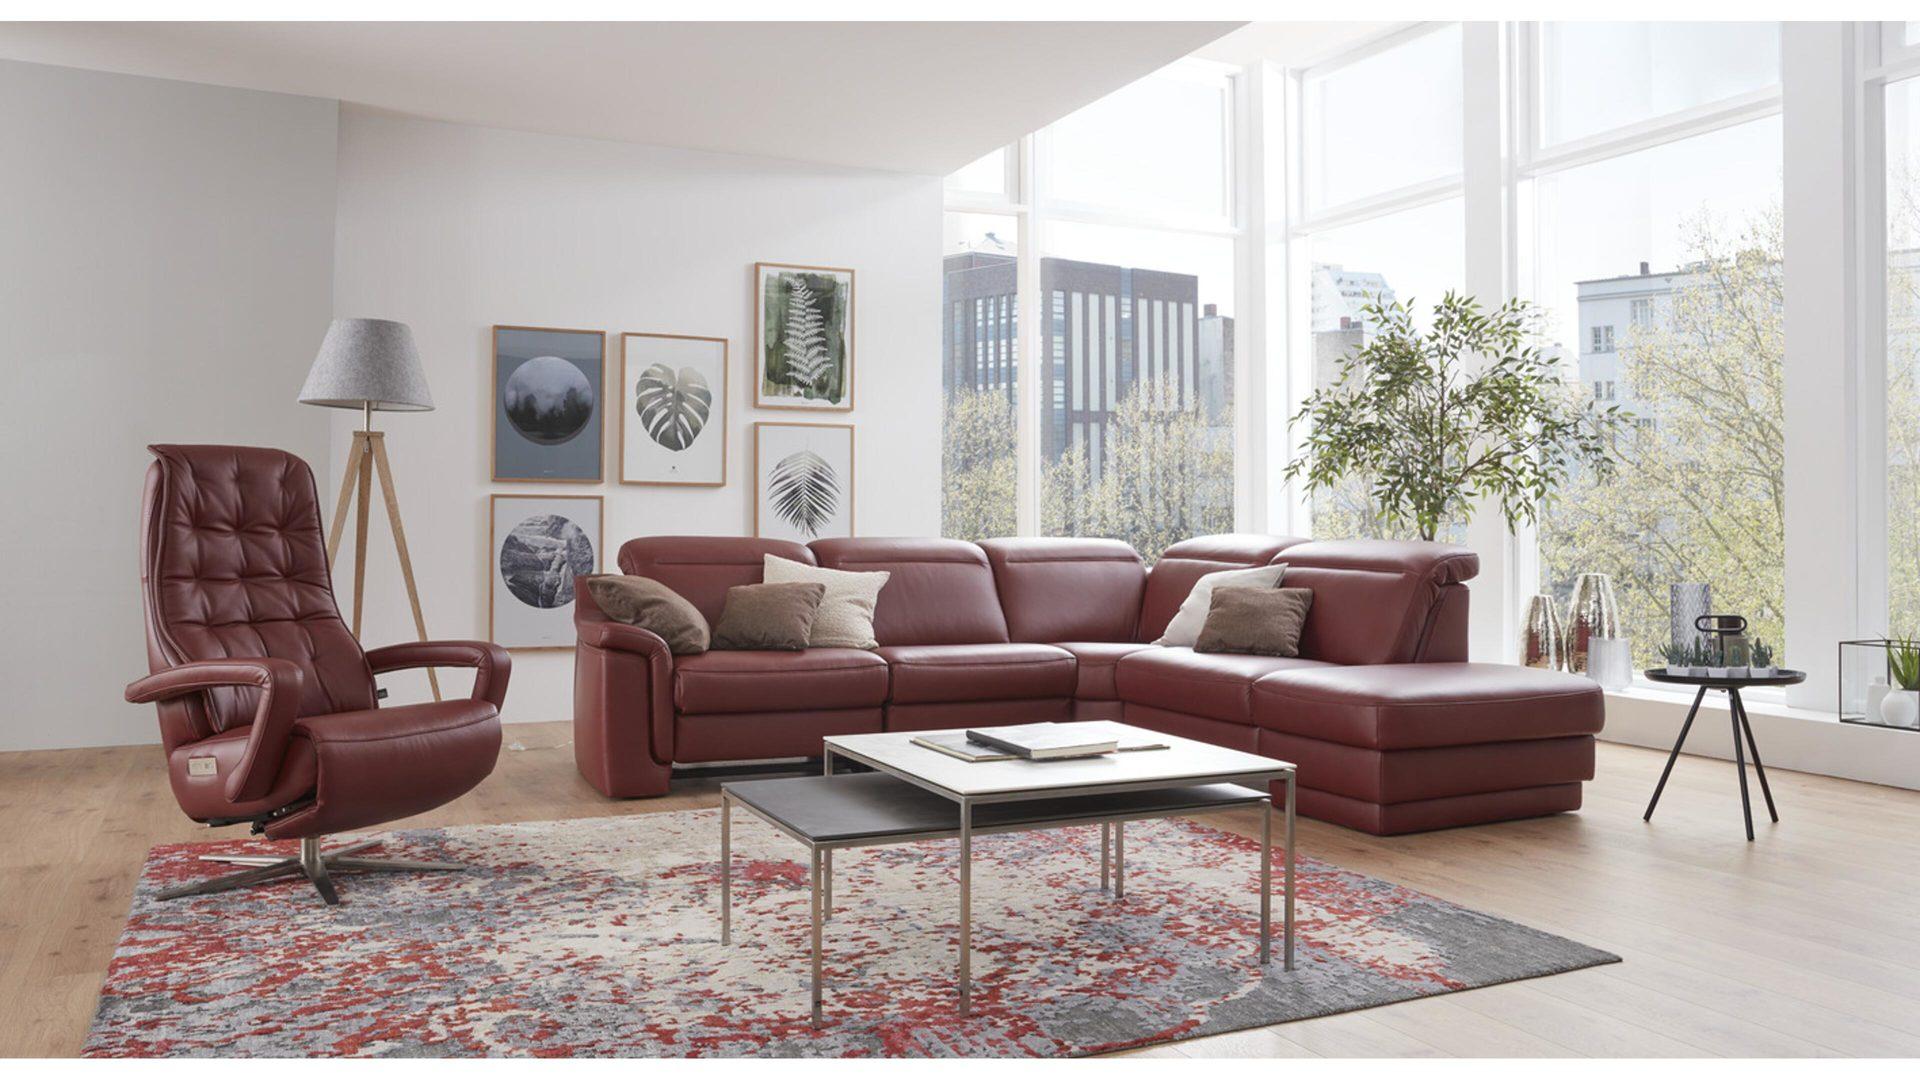 mobel boer coesfeld mobel a z alle mobel a z interliving interliving sofa serie 4052 eckkombination barolofarbenes leder credo schenkelmass ca